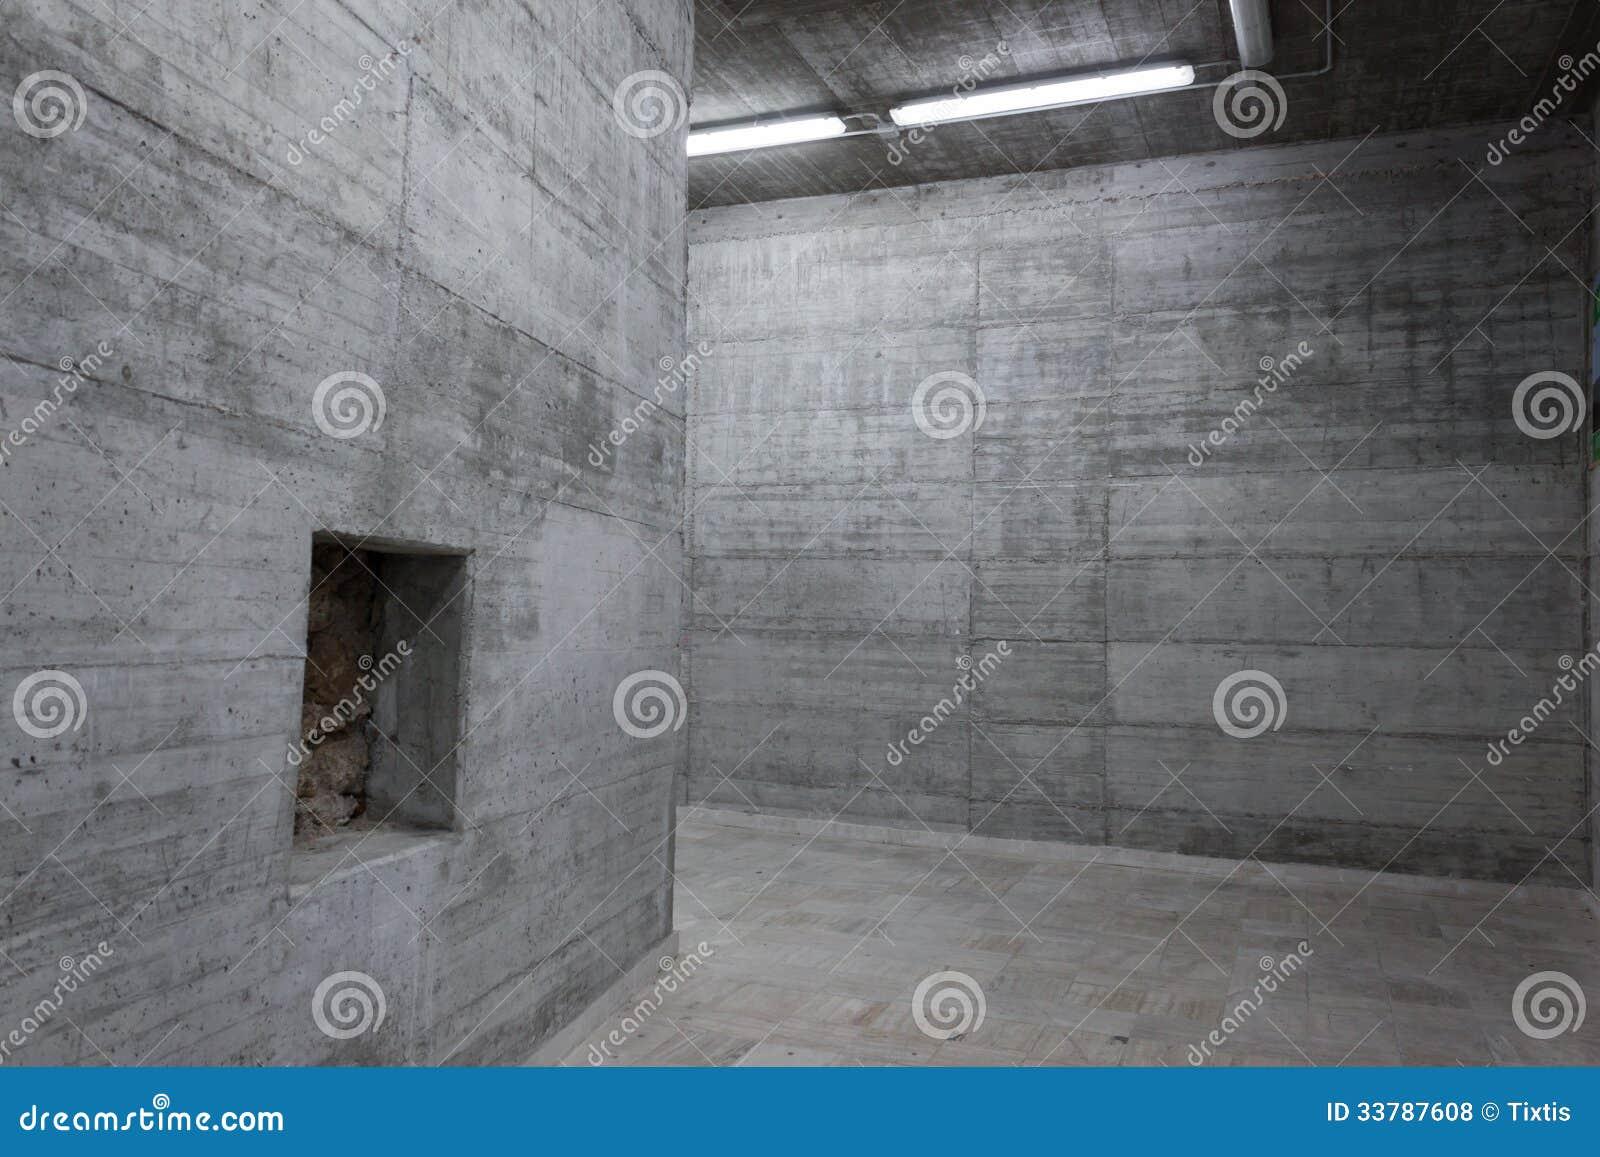 Concrete Wall Construction : Concrete walls inside a modern building stock photo